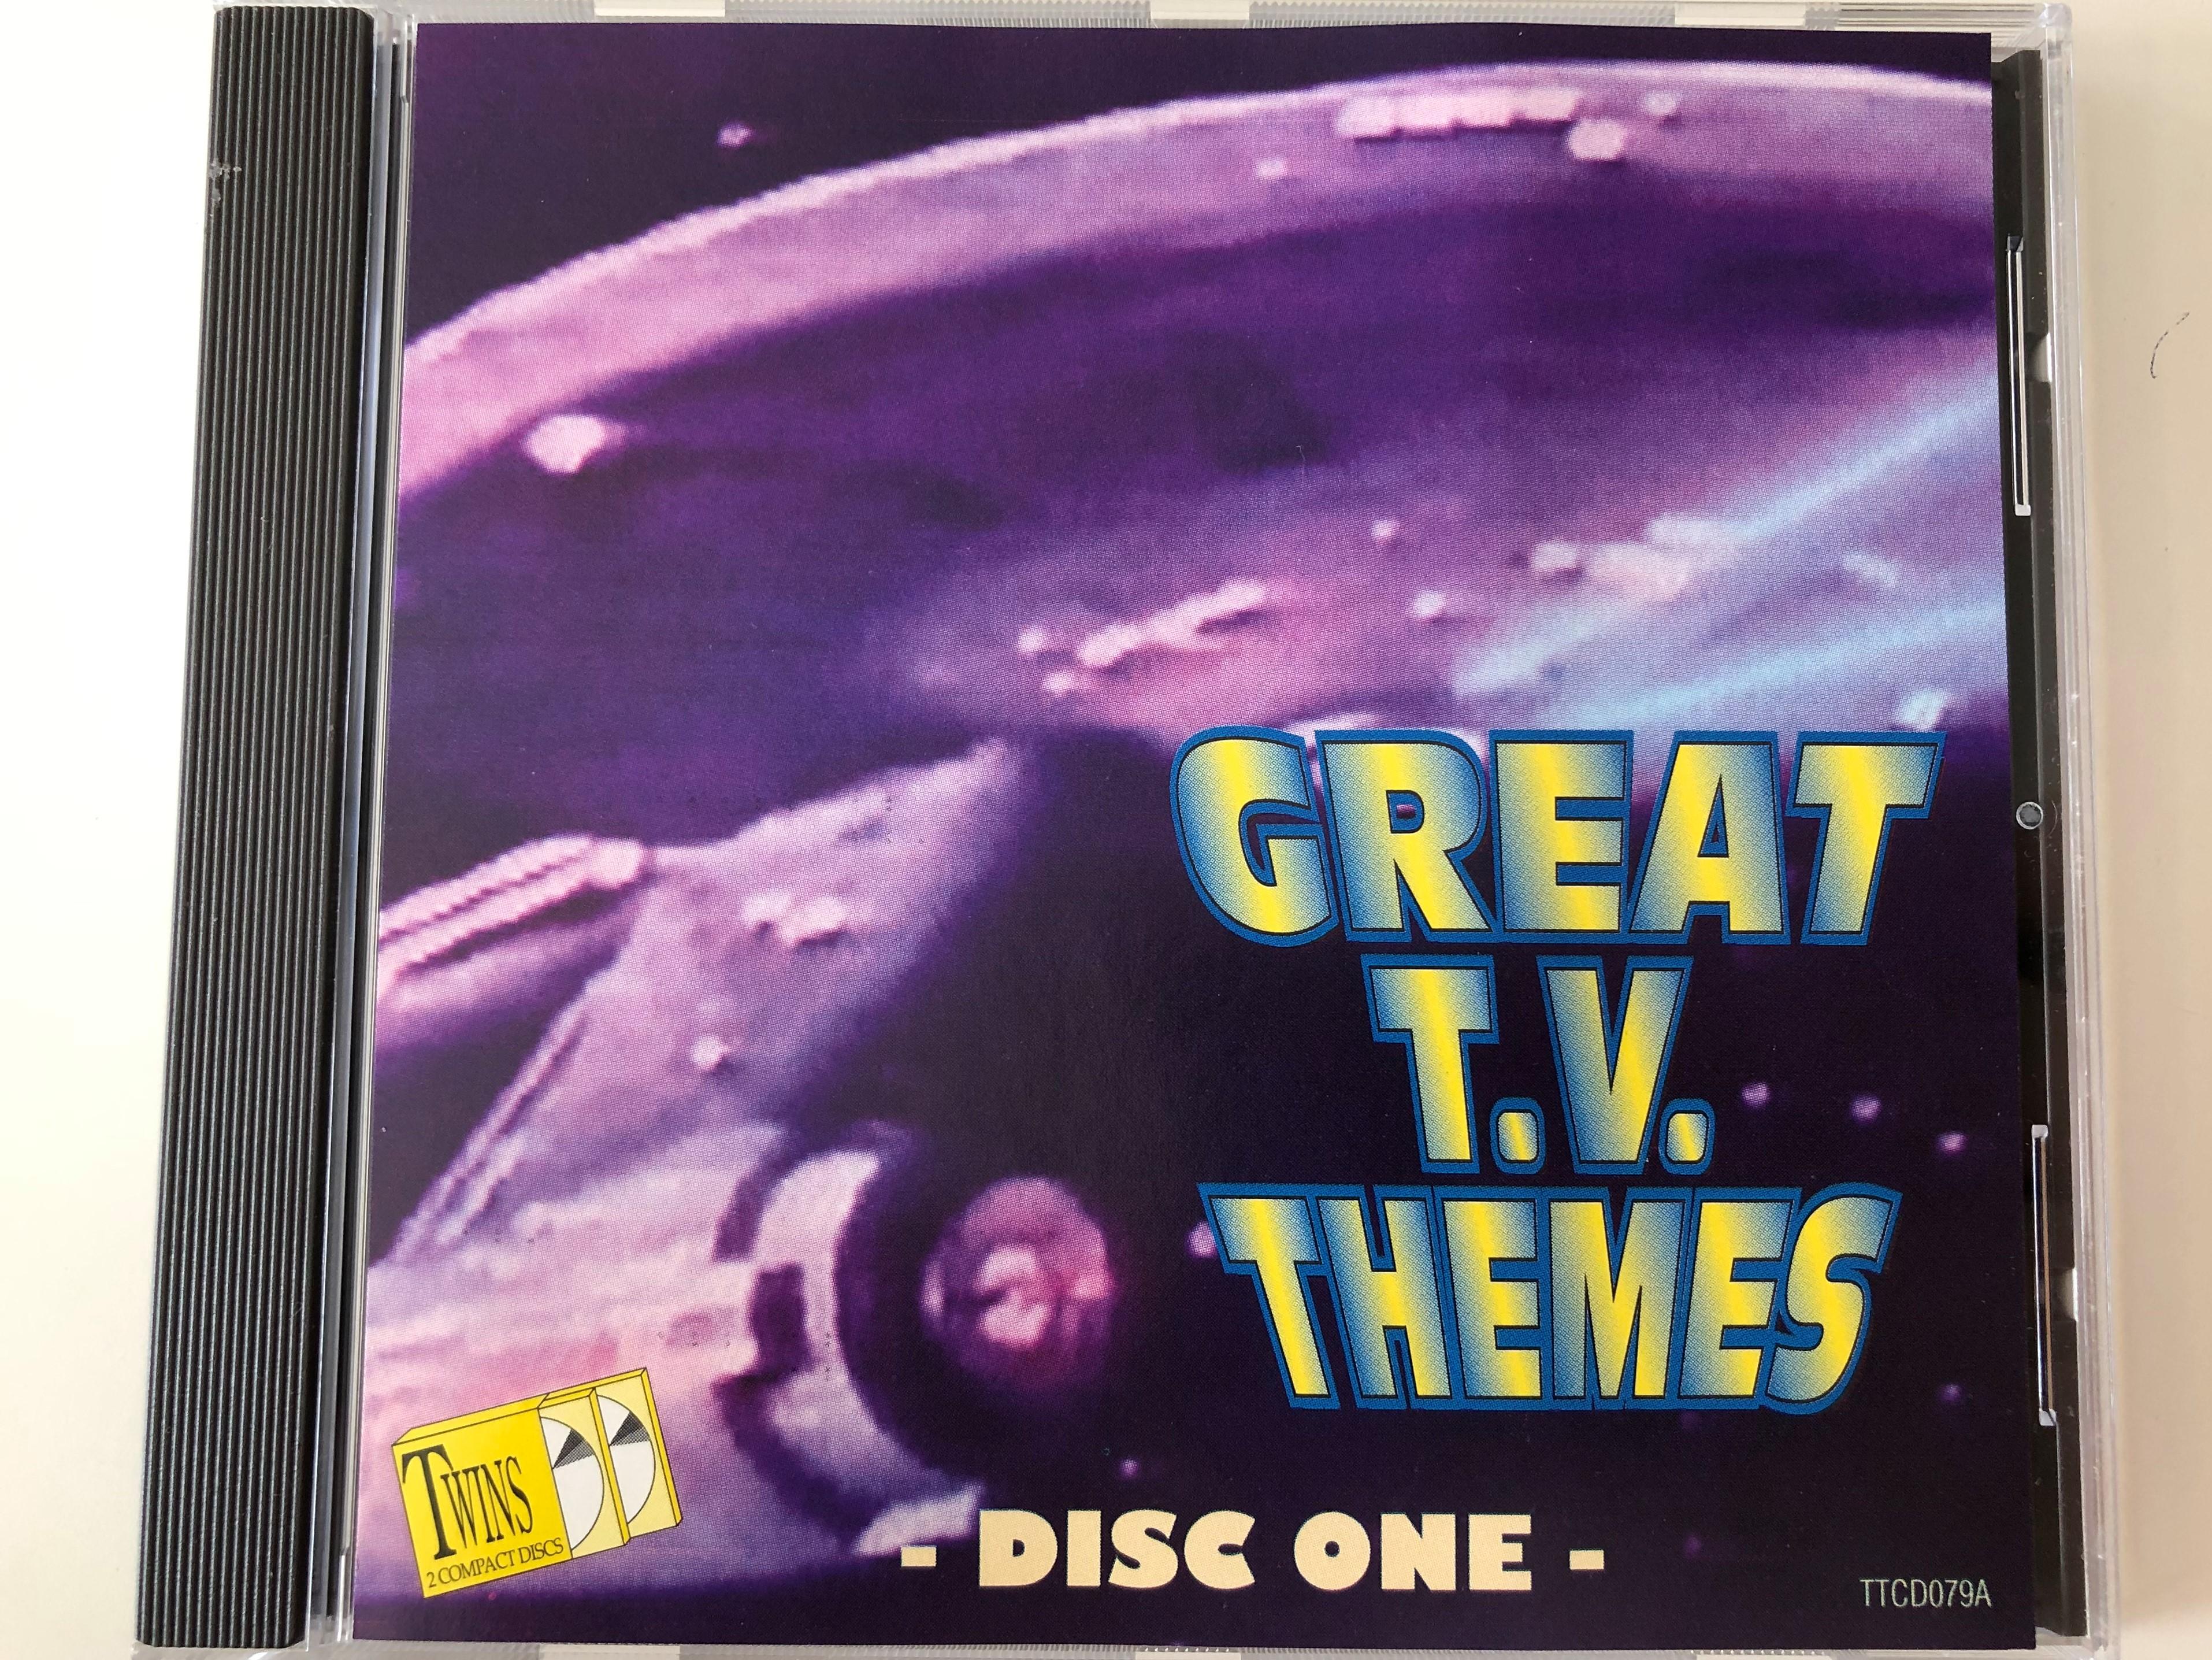 great-t.v.-themes-disc-one-tring-international-plc-audio-cd-ttcd079a-1-.jpg